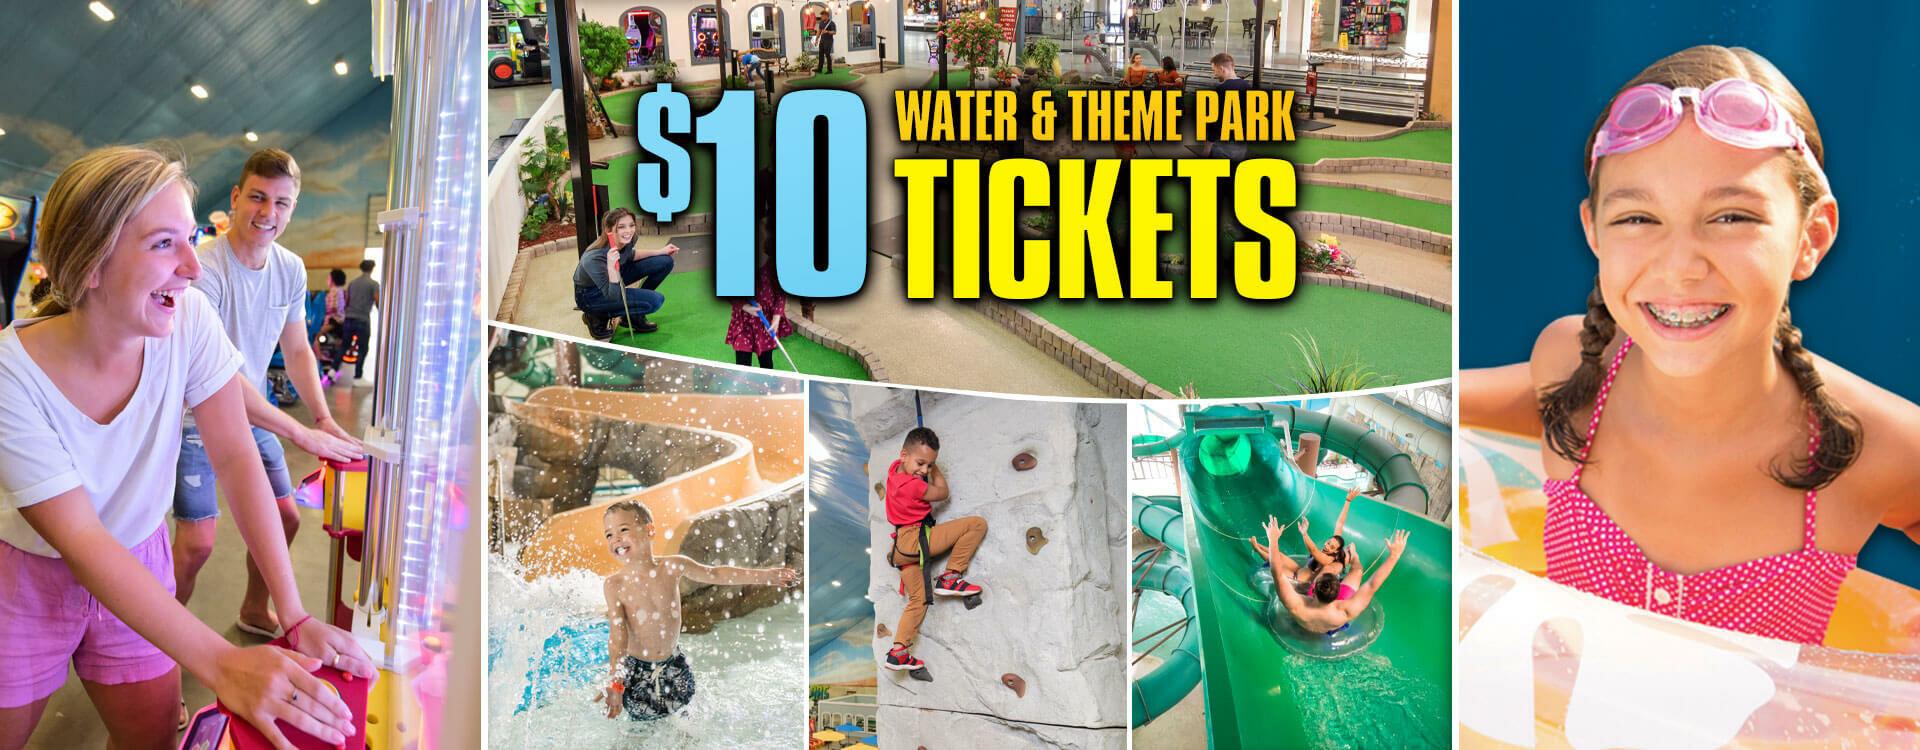 Hades 360 Mt. Olympus Water & Theme Park